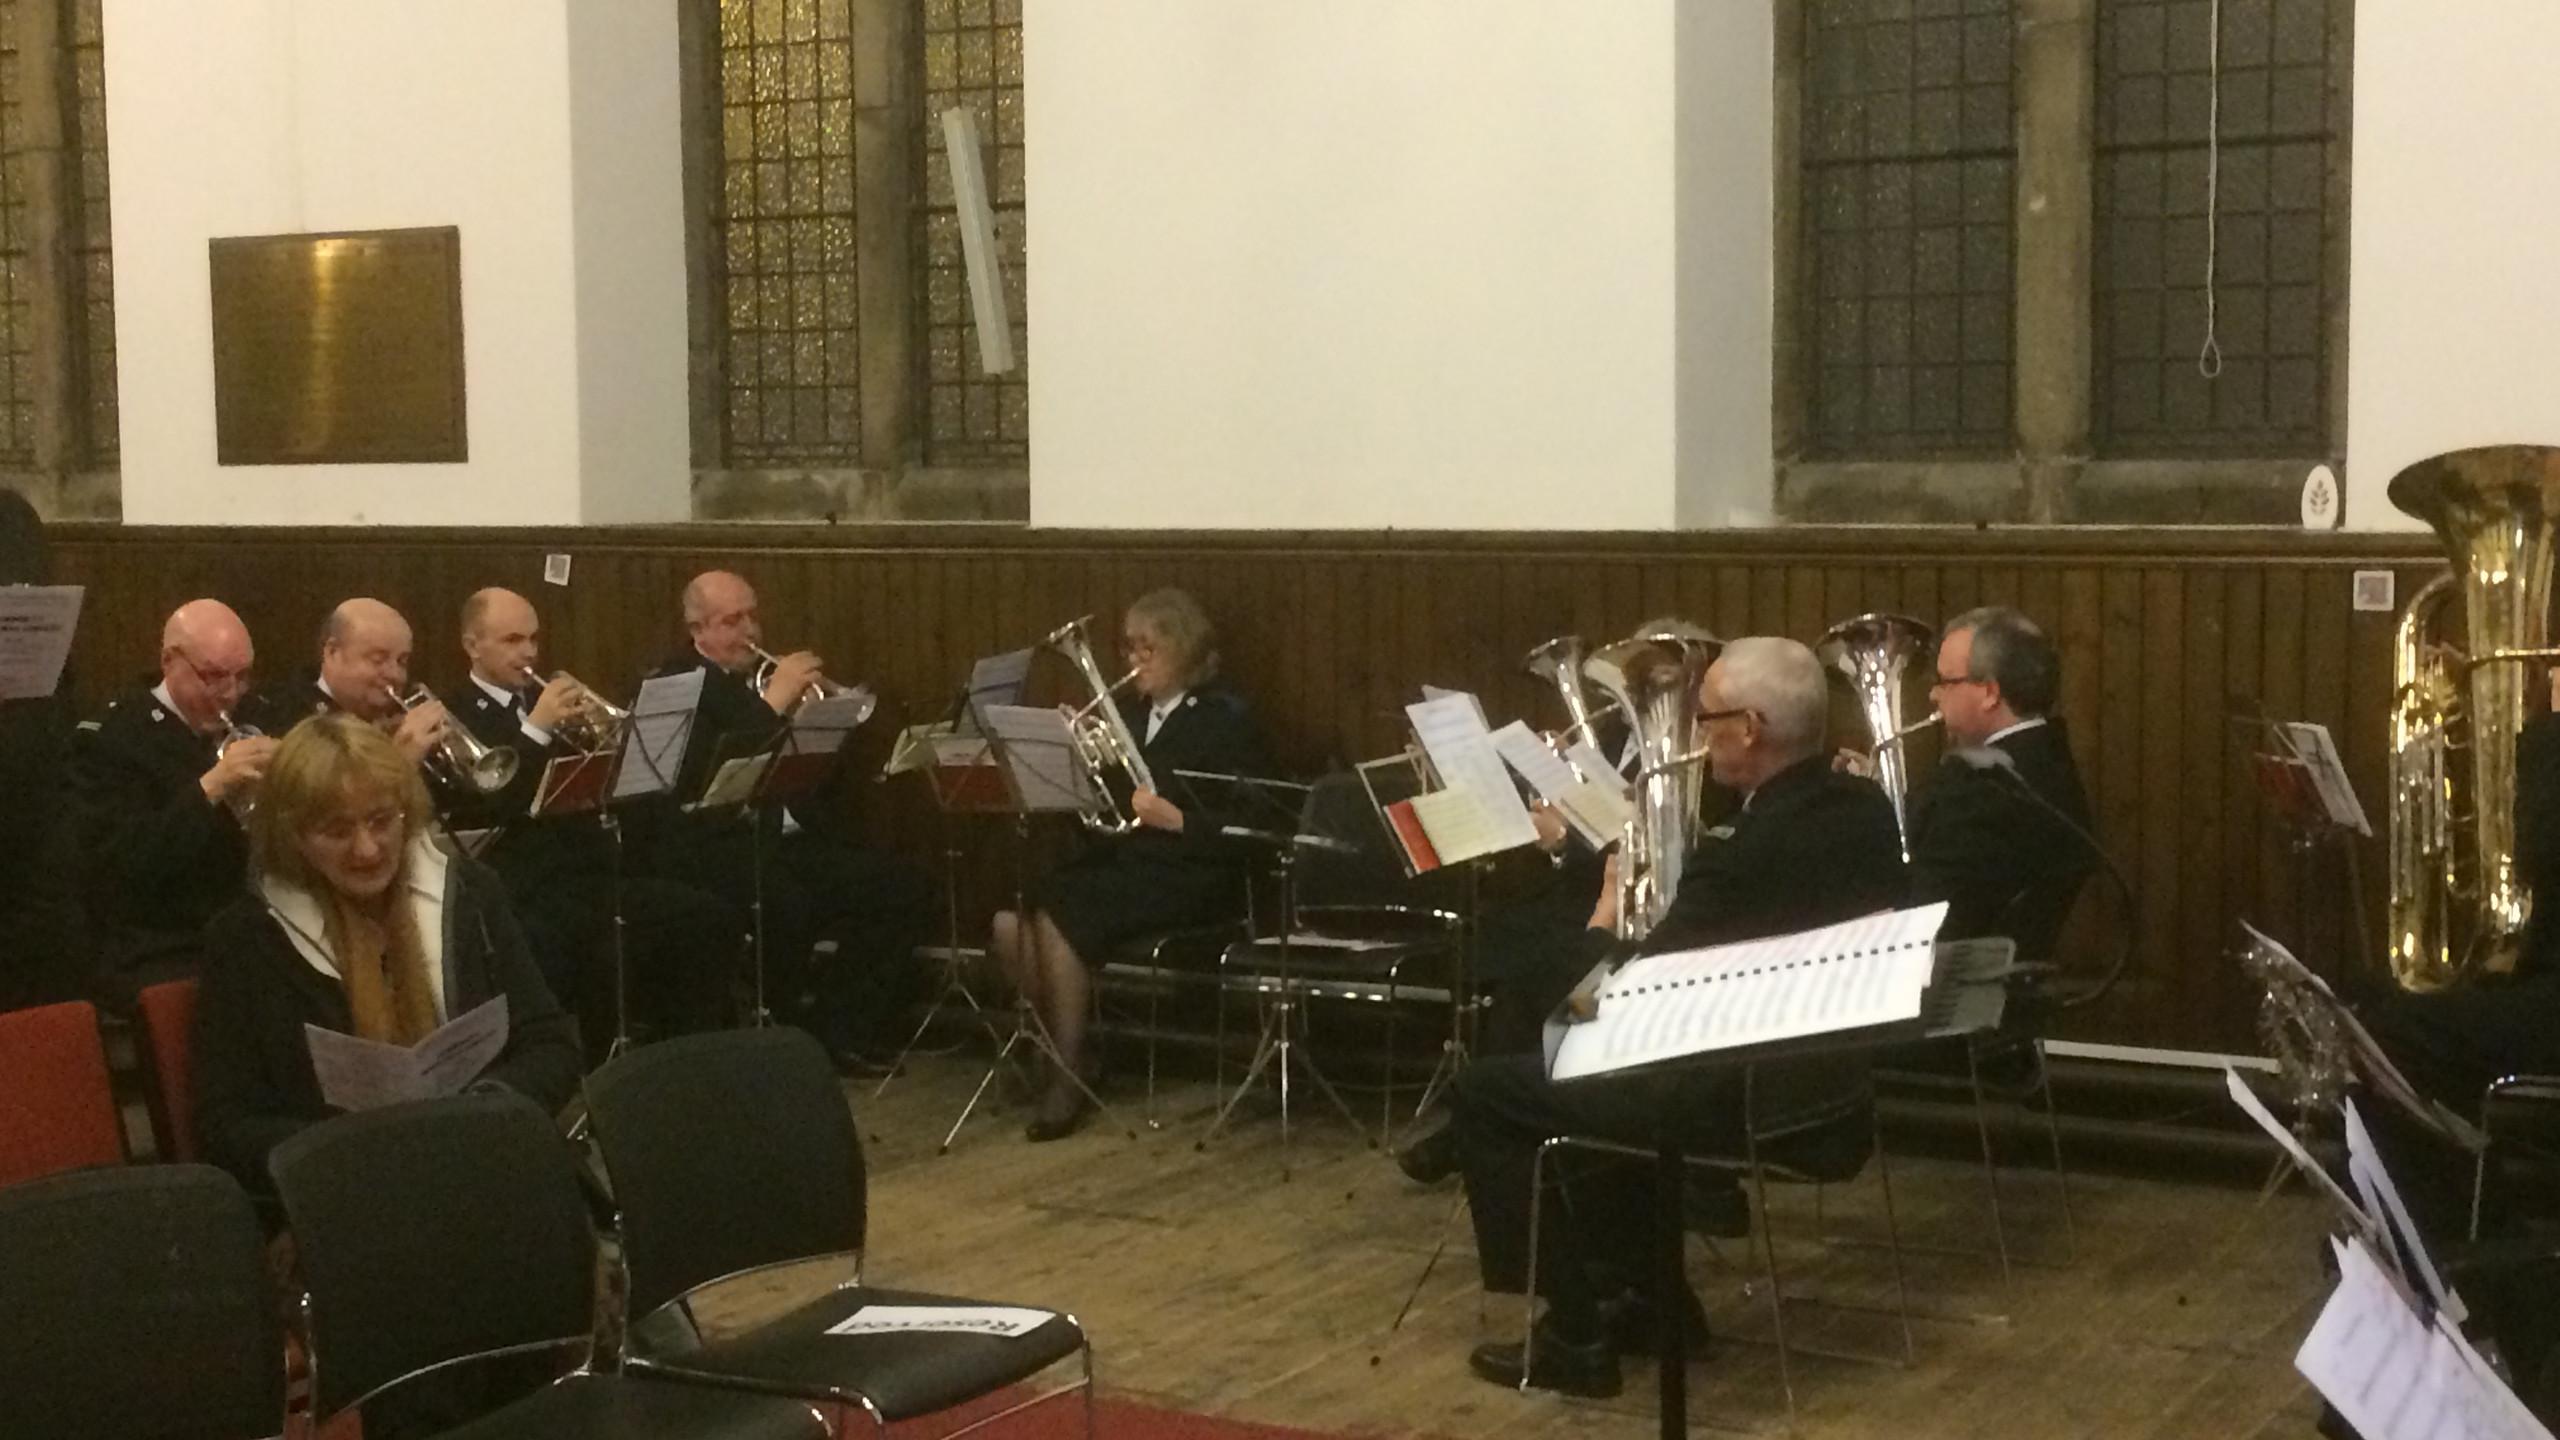 Edinburgh City Salvation Army Band